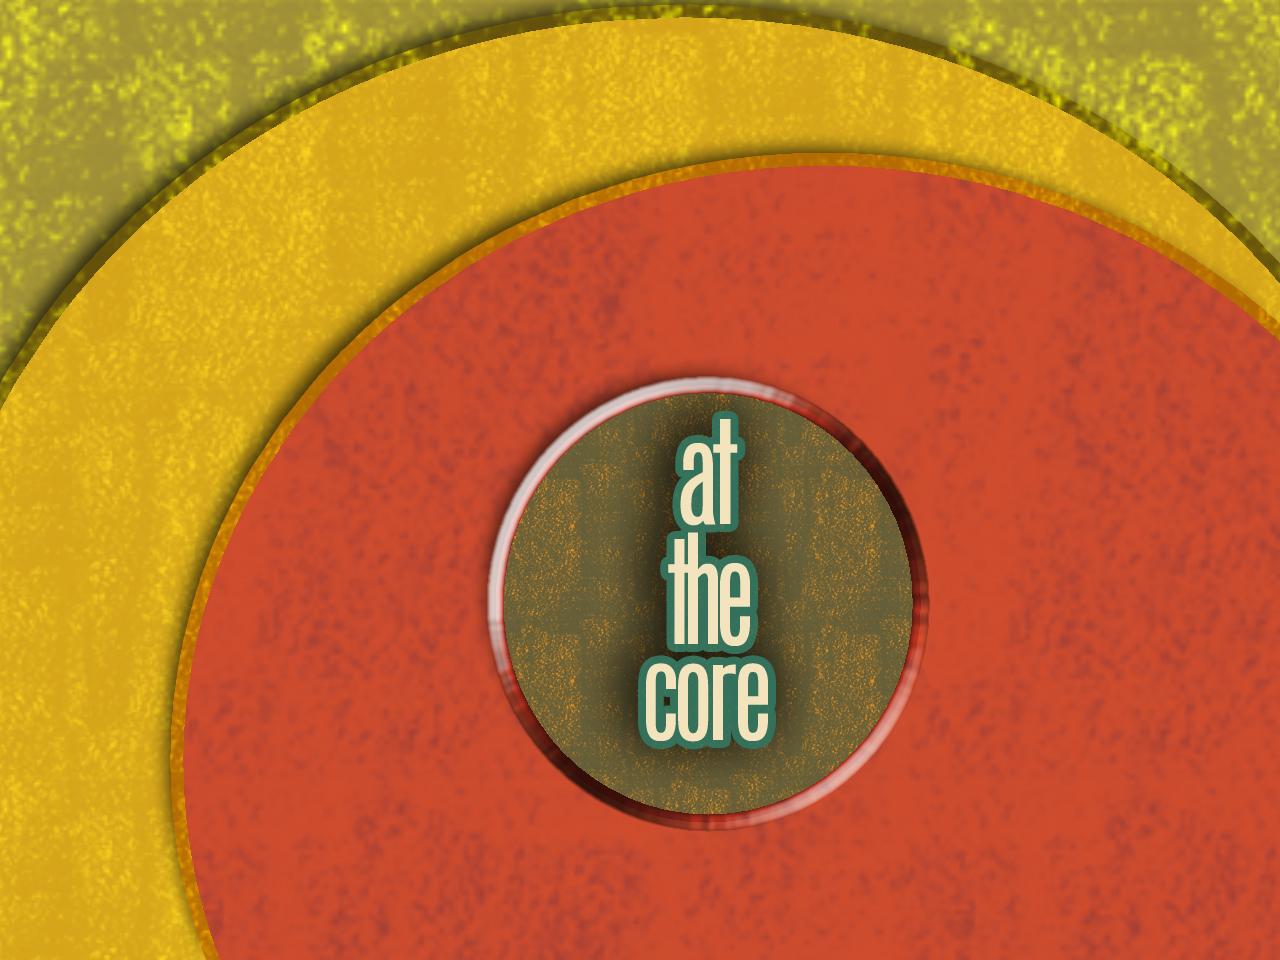 Core CMS platforms